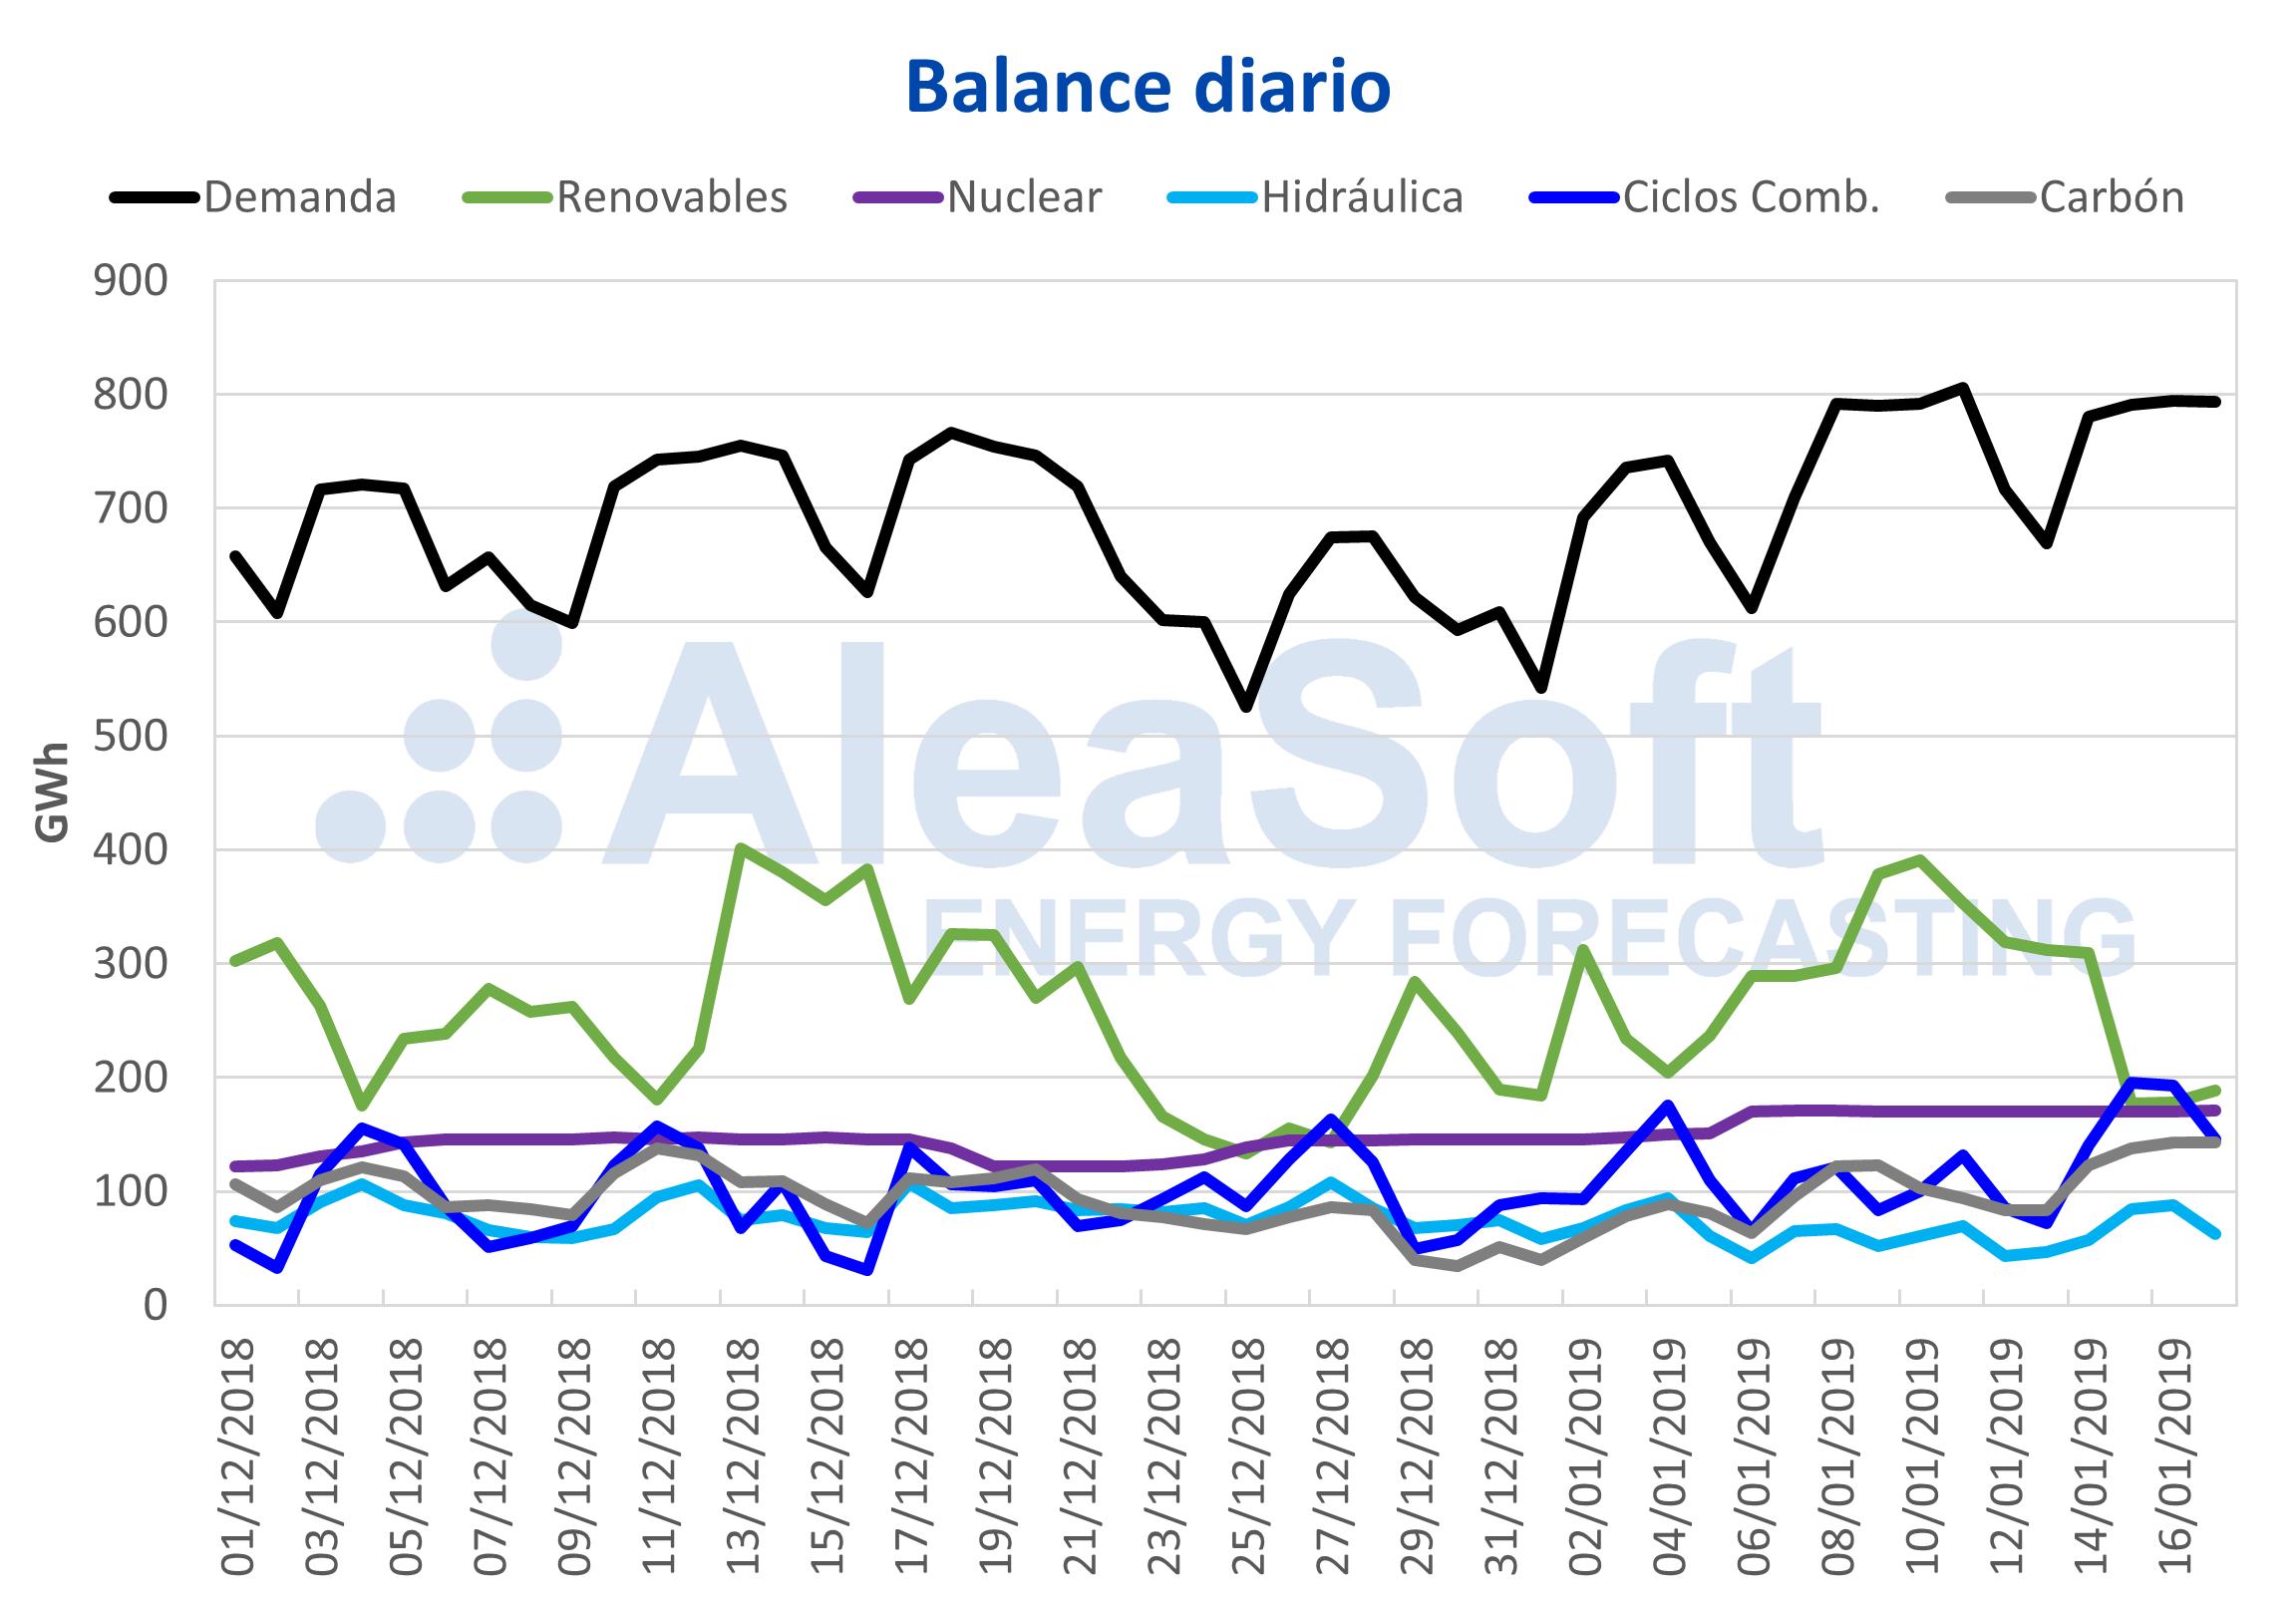 AleaSoft - Balance diario de electricidad España